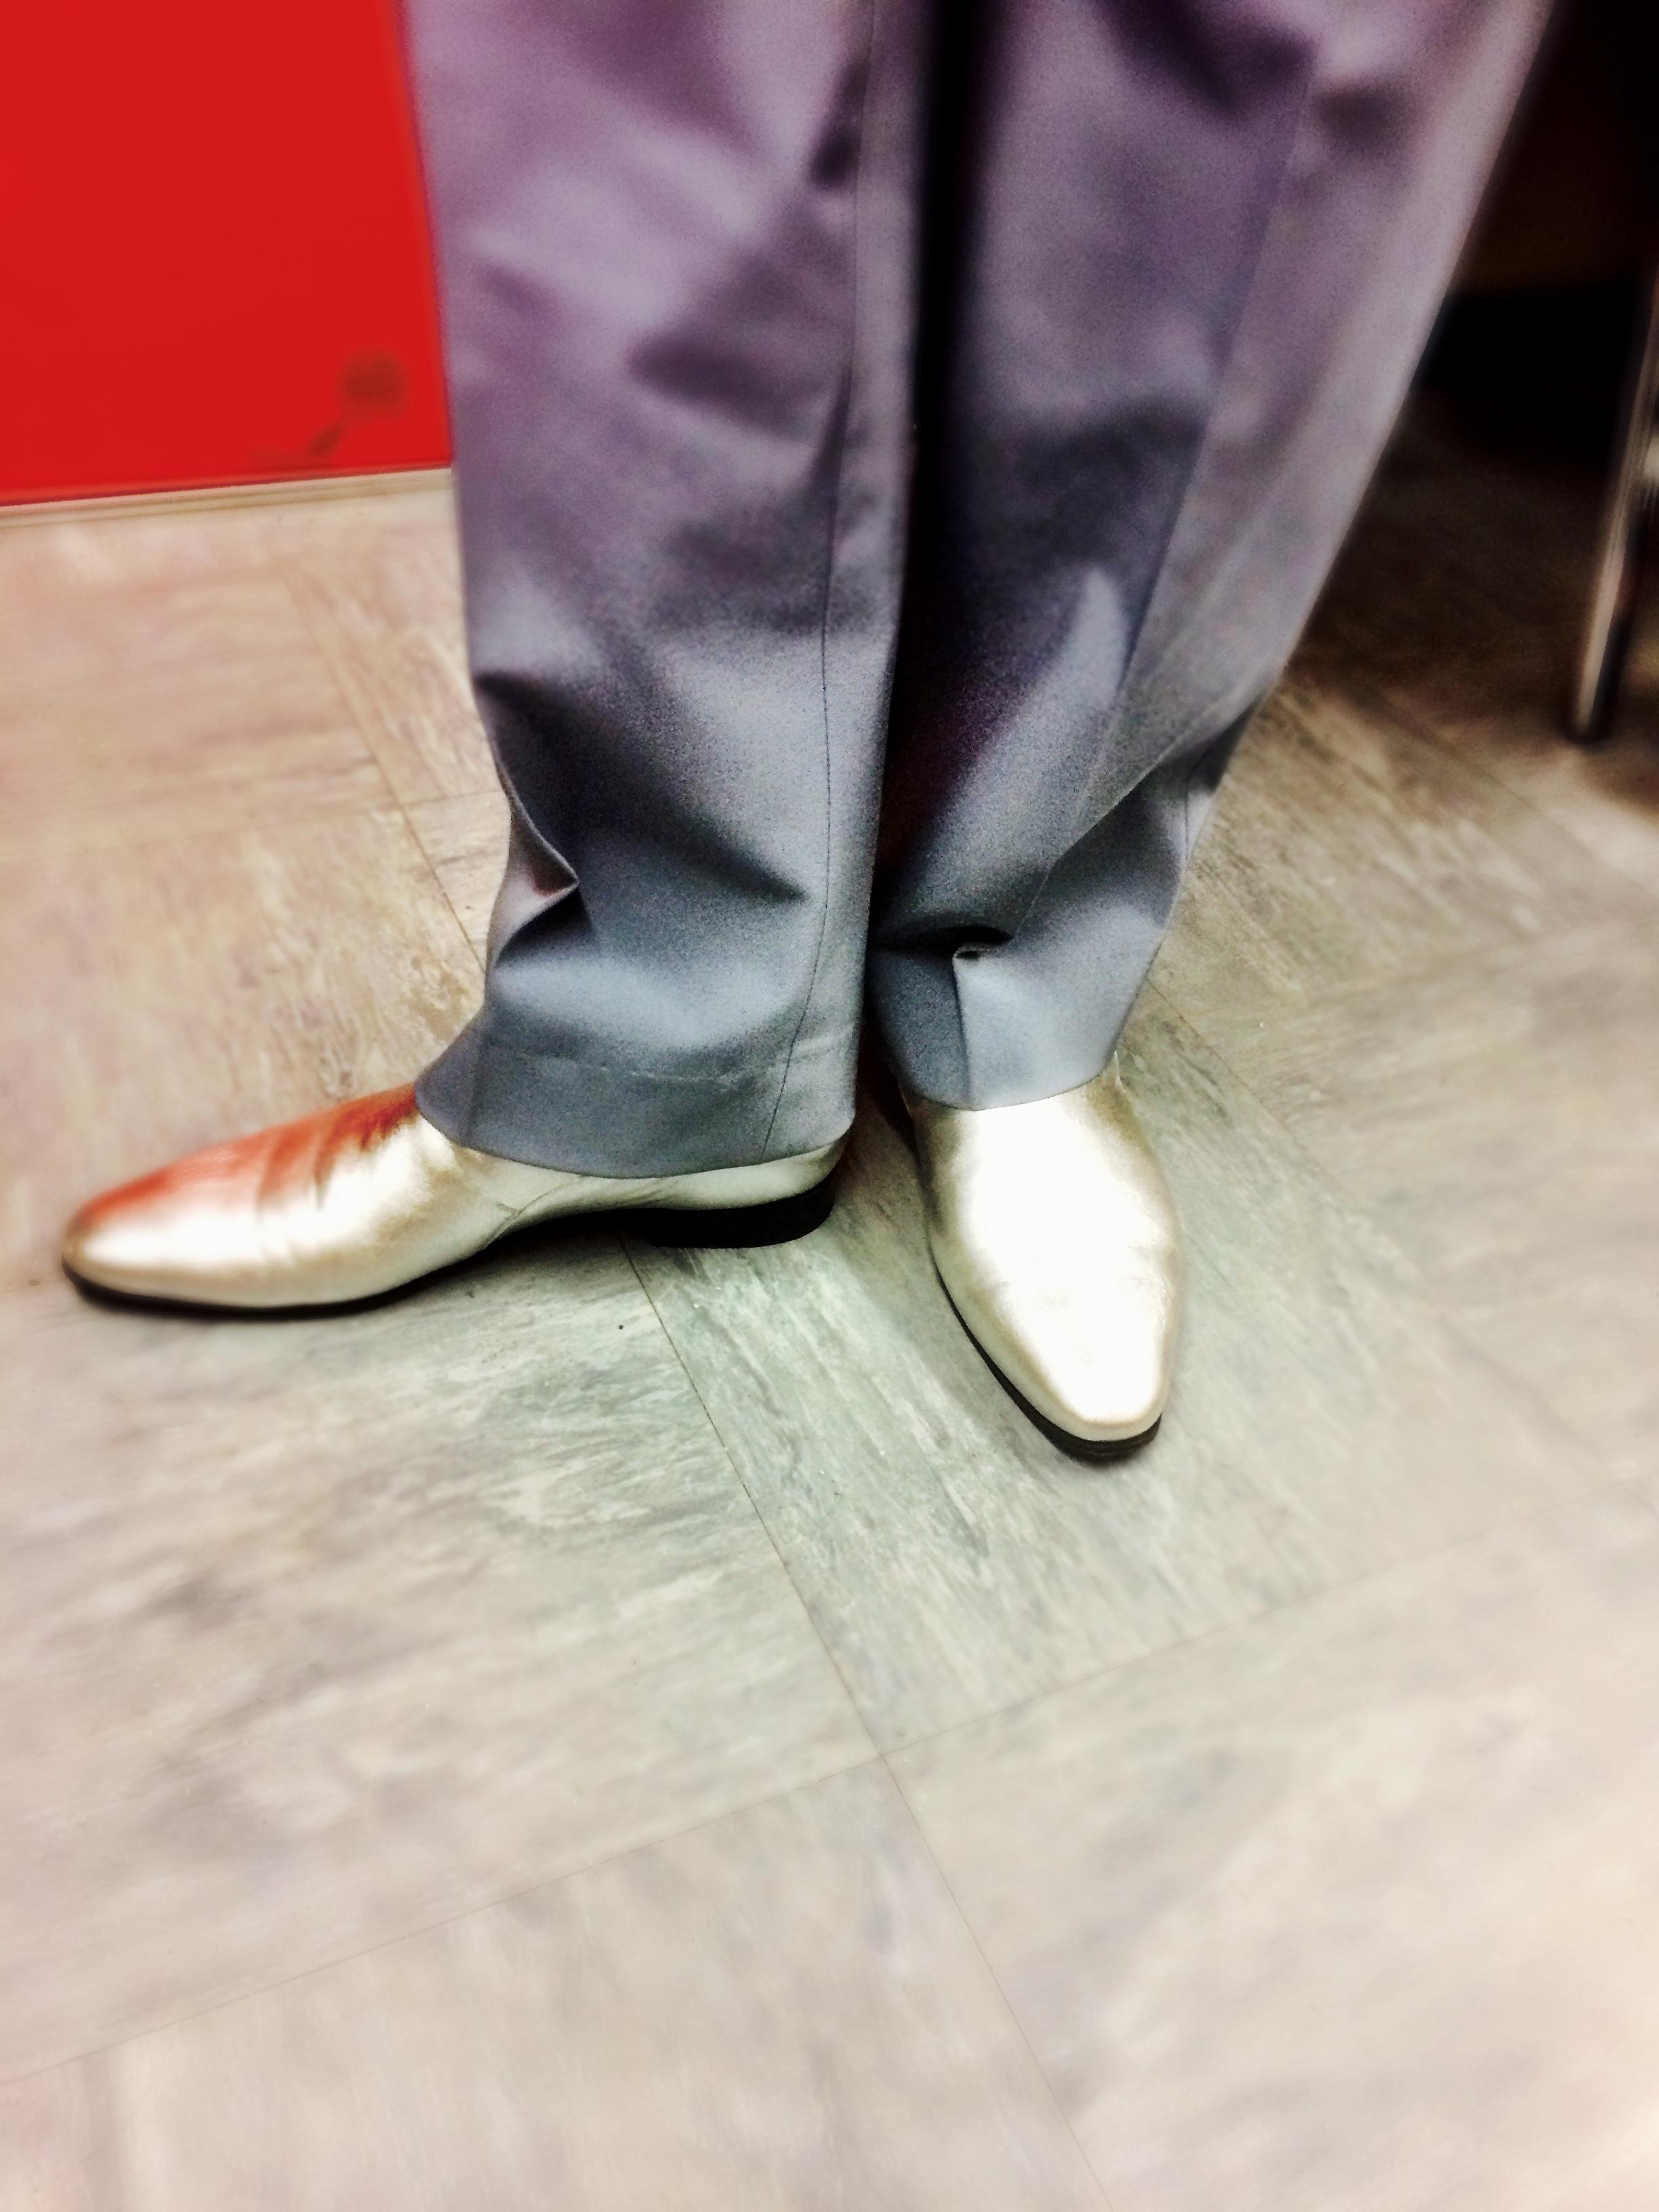 Jim's silver shoes